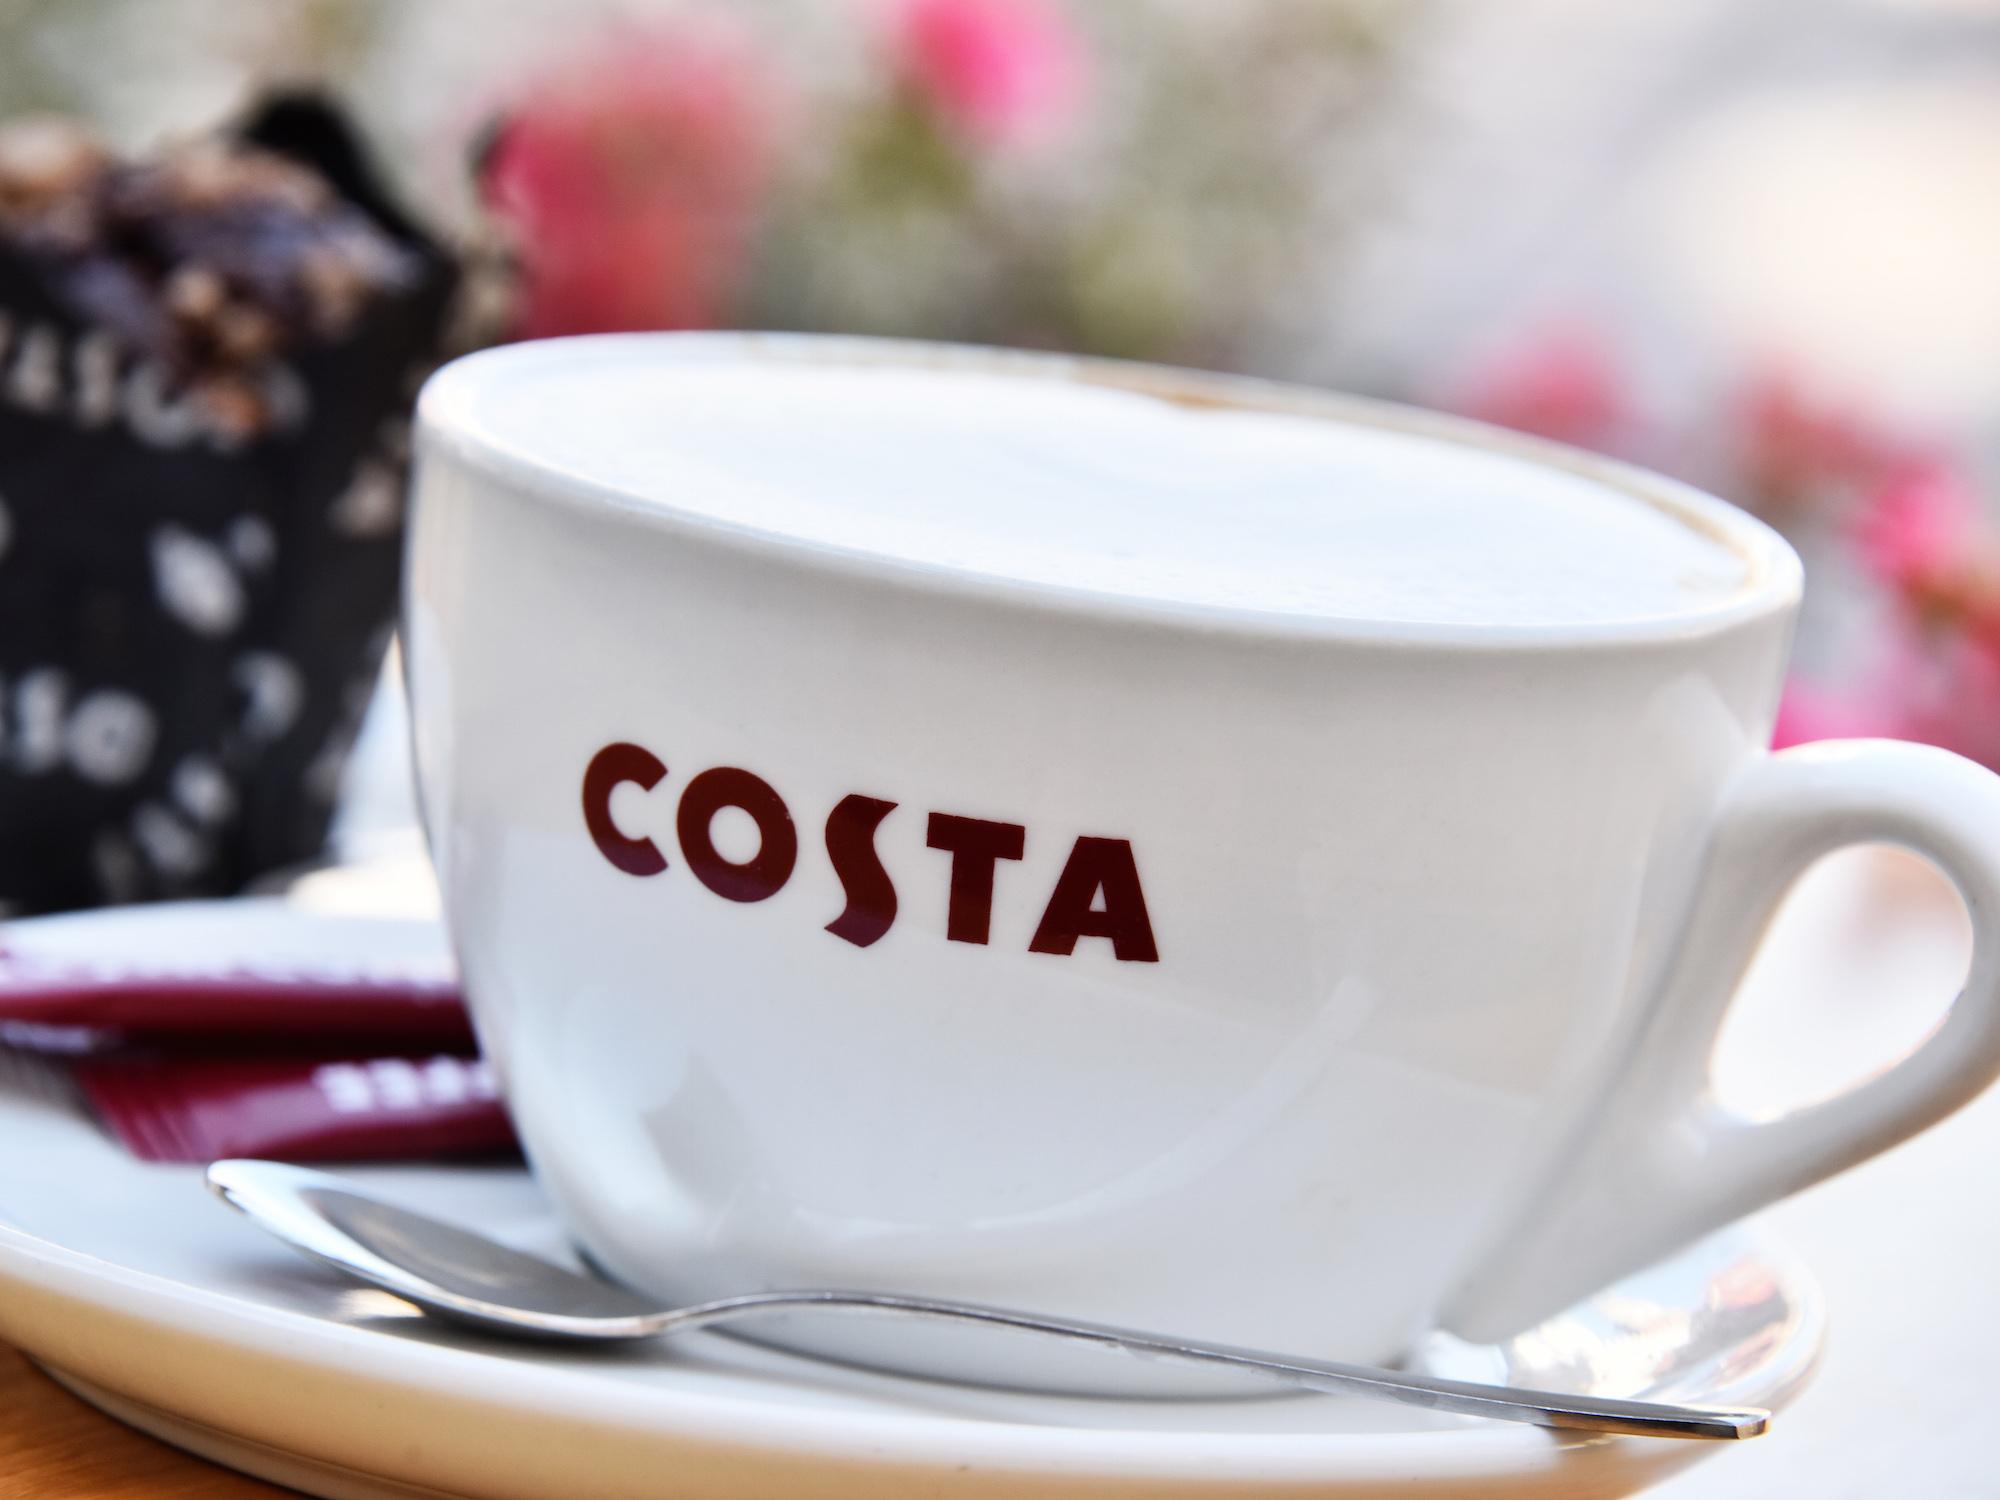 costa-coffee-flat-black.jpg